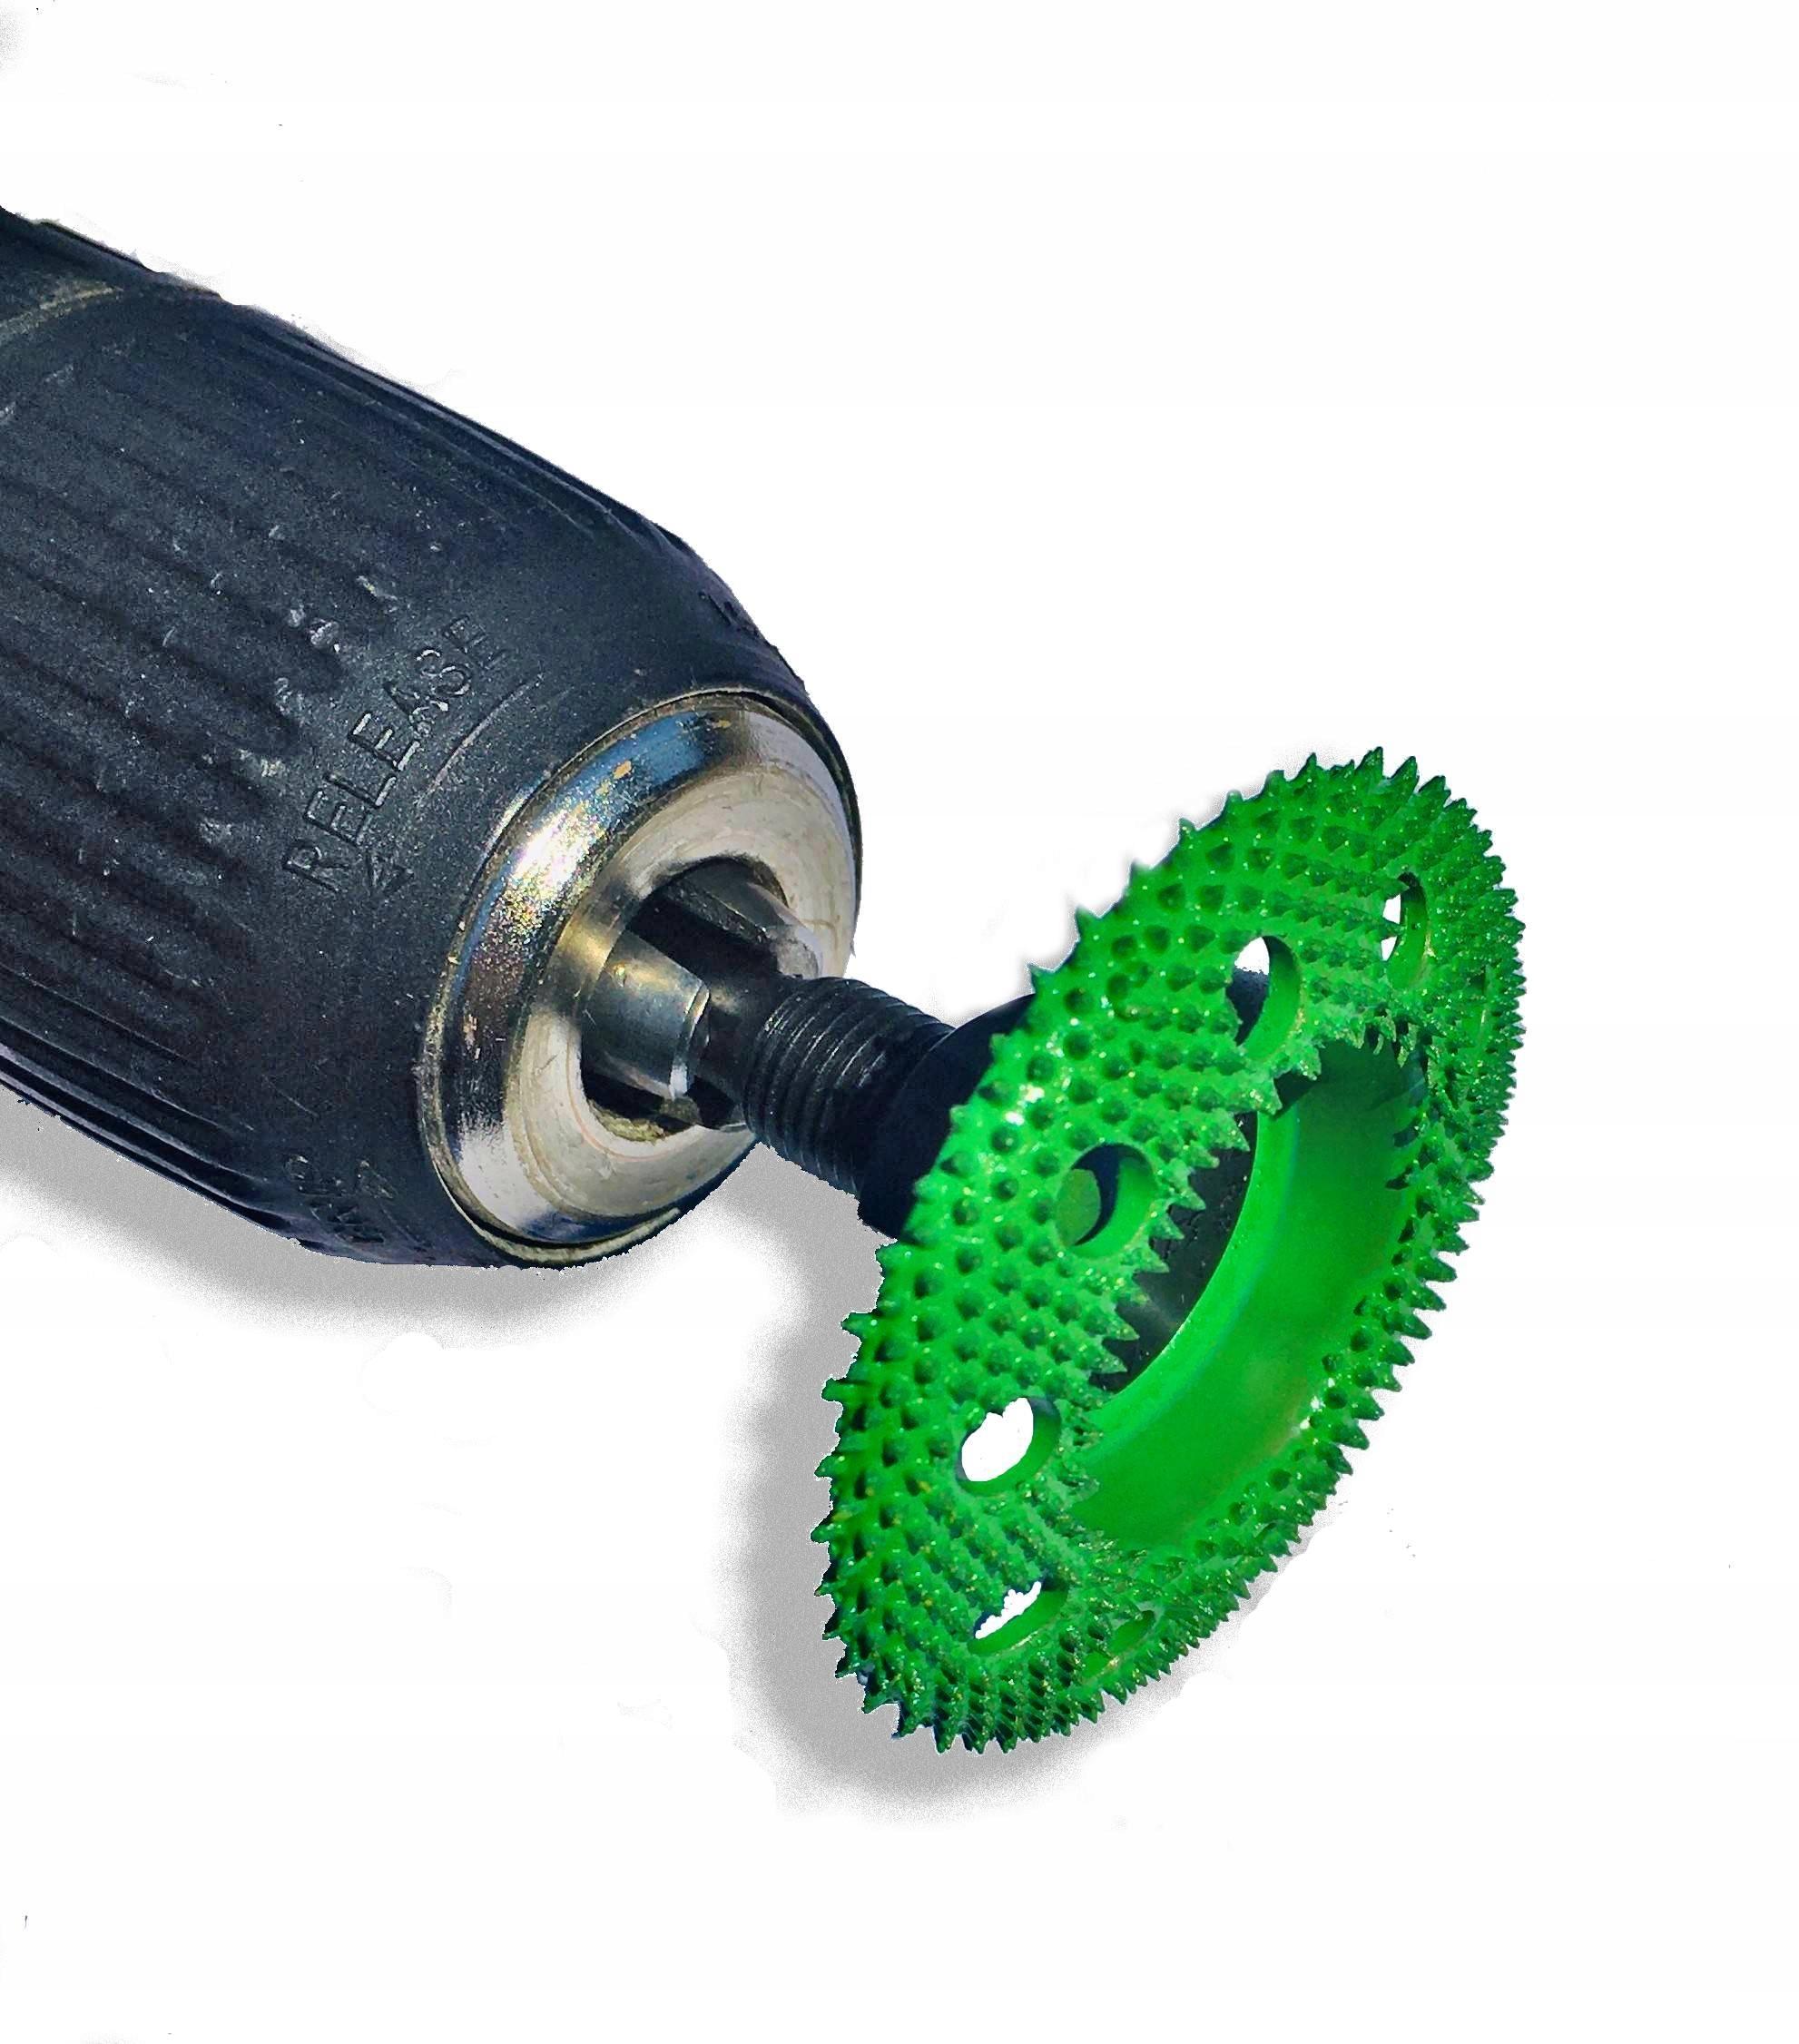 adaptér pre rovnú brúsku na disky sabur 50 mm